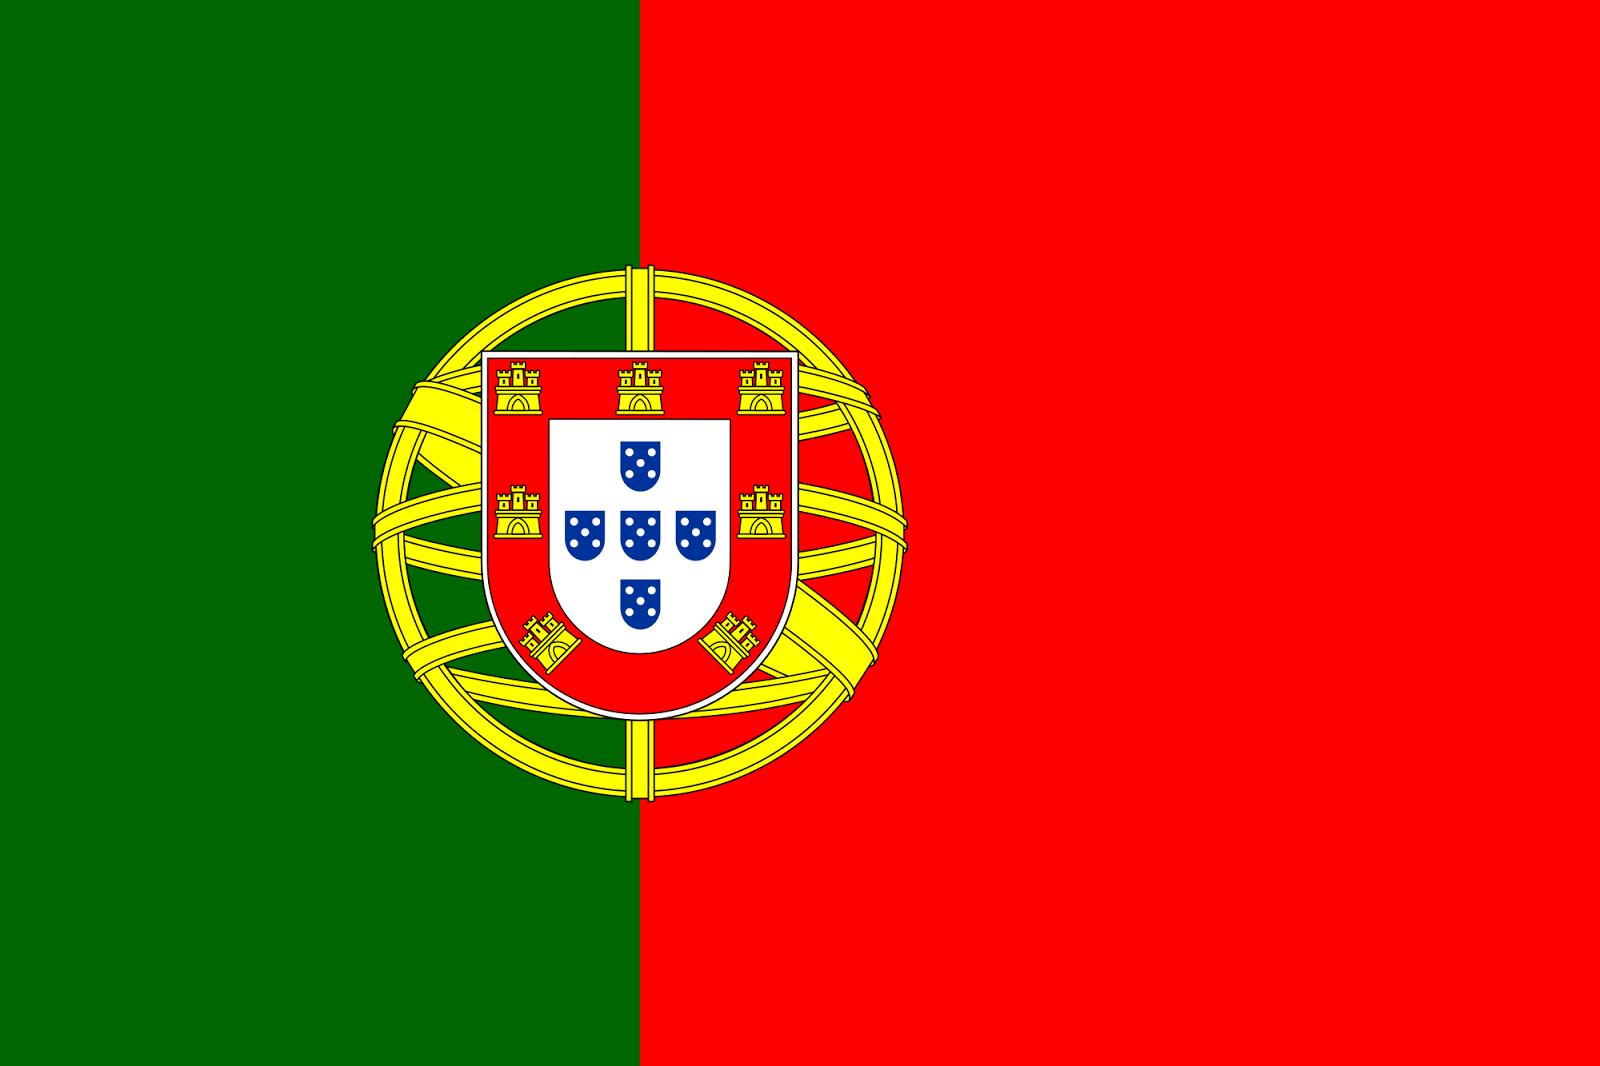 http://carbrandsincurrentproduction.blogspot.com.es/search/label/Portugal